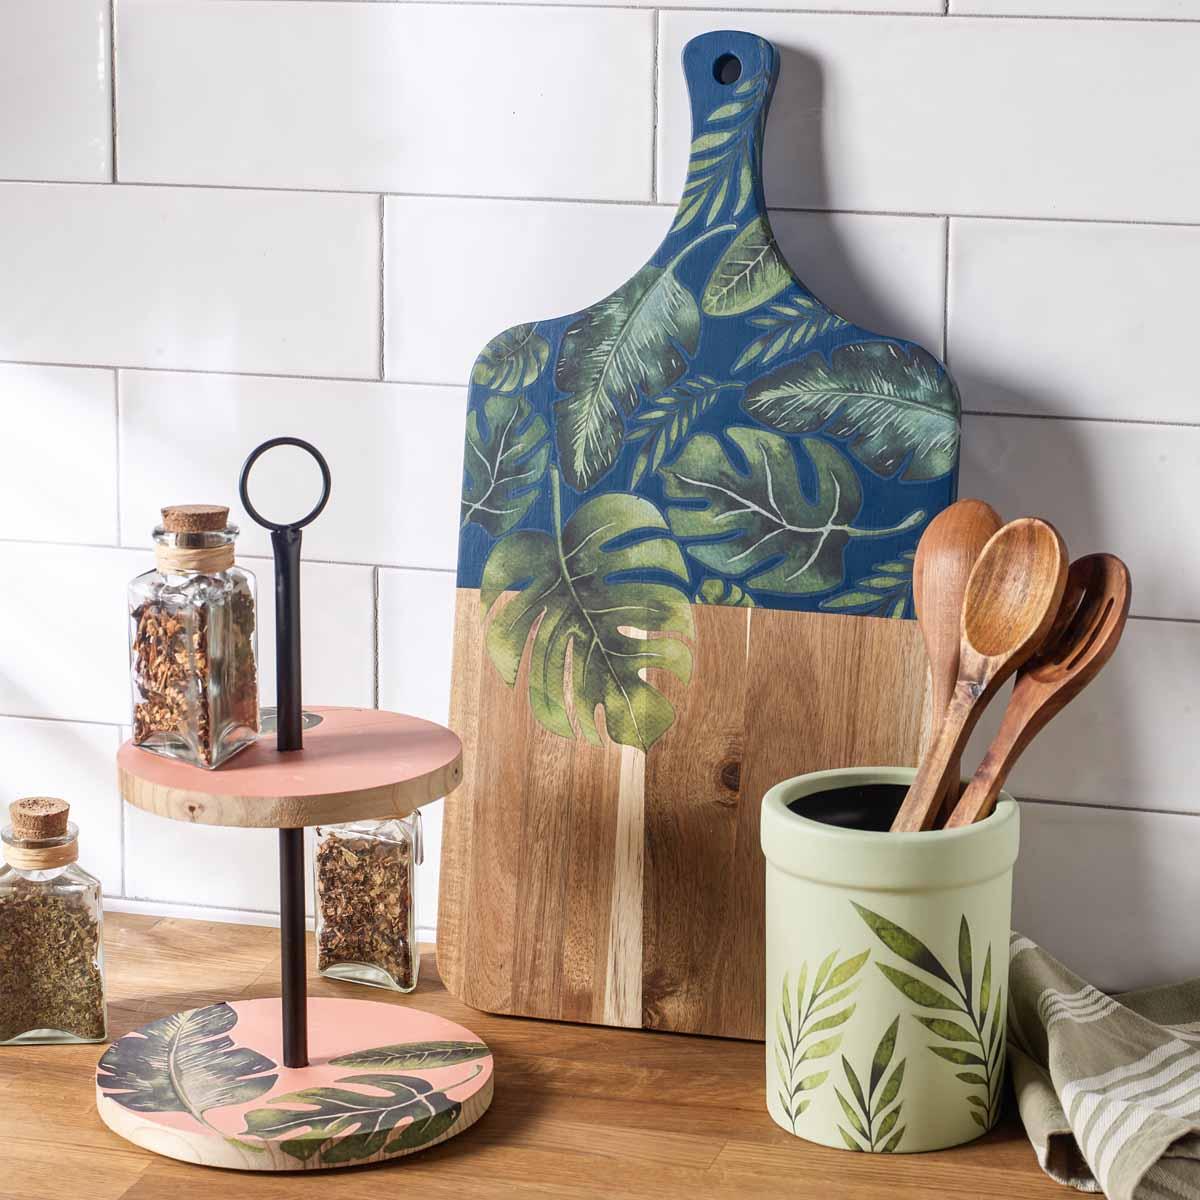 Easy Rub-On Transfer Kitchen Accessories